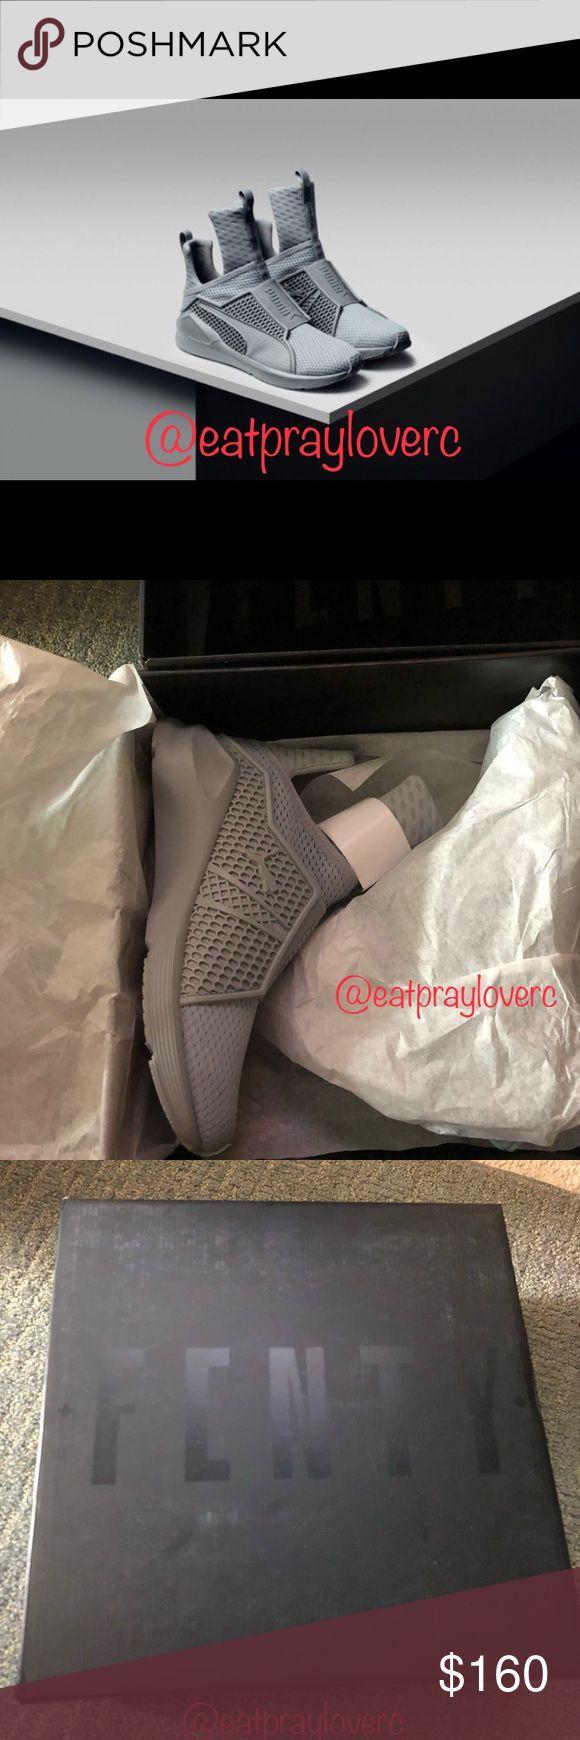 Fenty Puma by Rihanna Fierce Core Training/ Size 7 Brand New in Box Never worn Size 7M Puma Shoes Sneakers